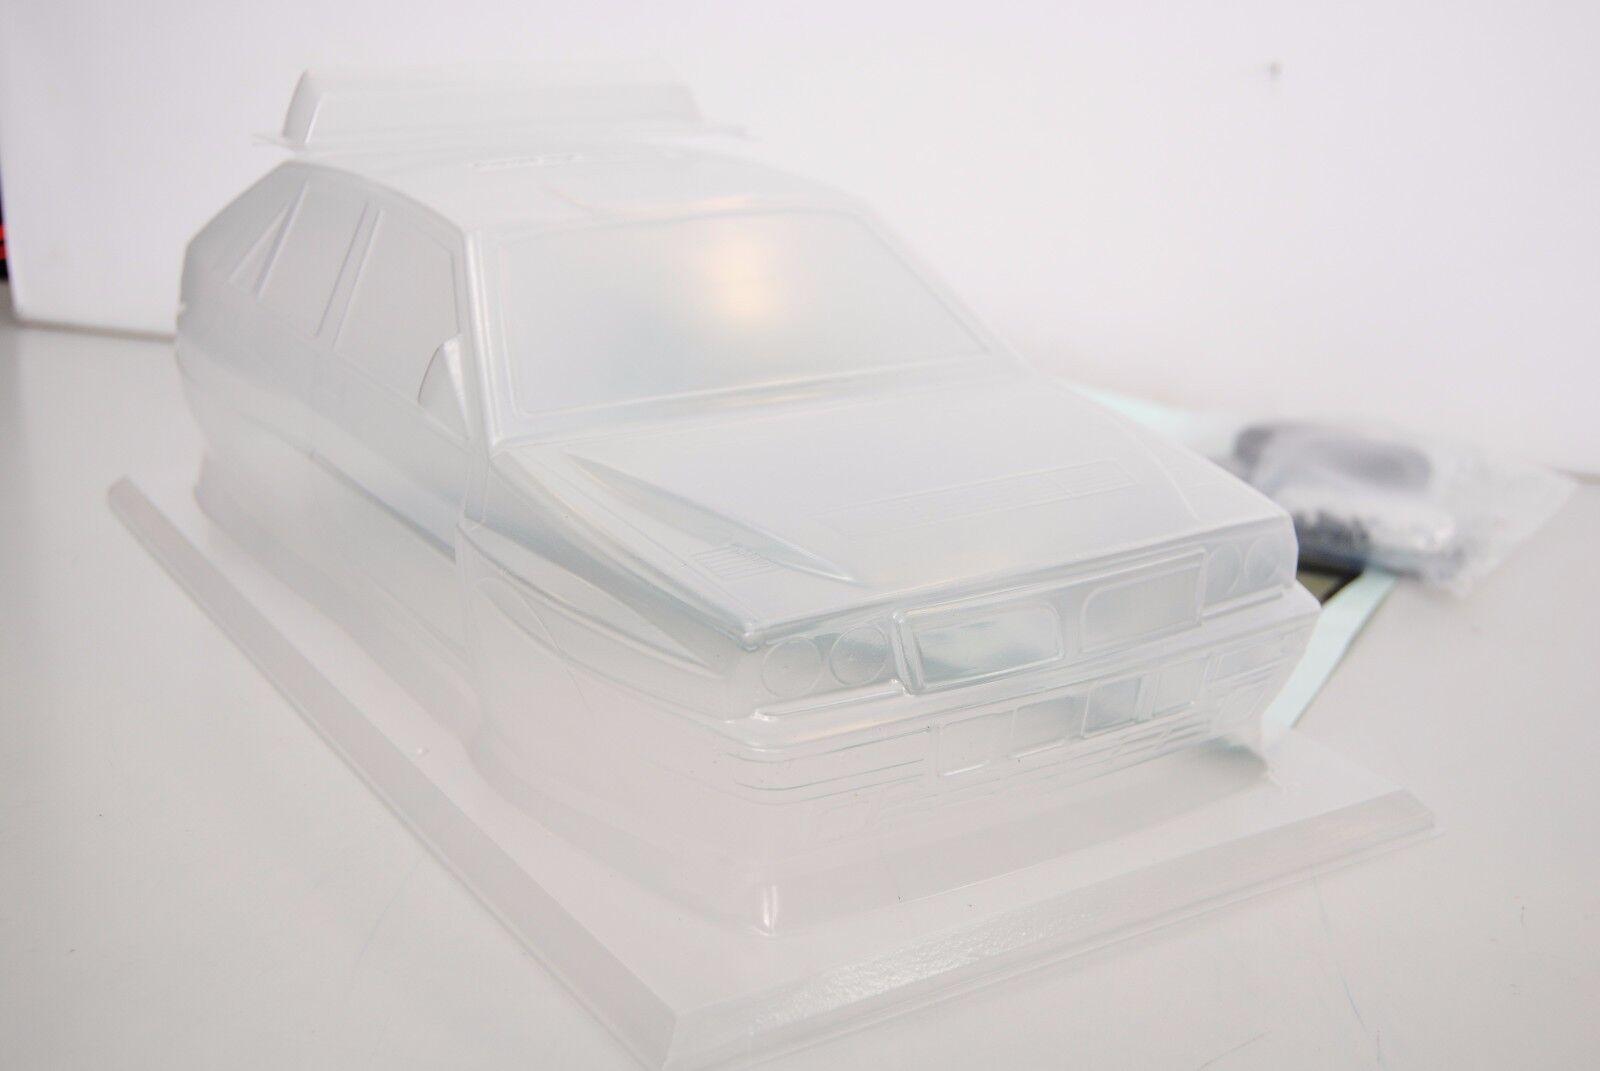 THE RALLY LEGENDS Bodywork Transparent LANCIA Delta EVO + Adhesives SPEAR